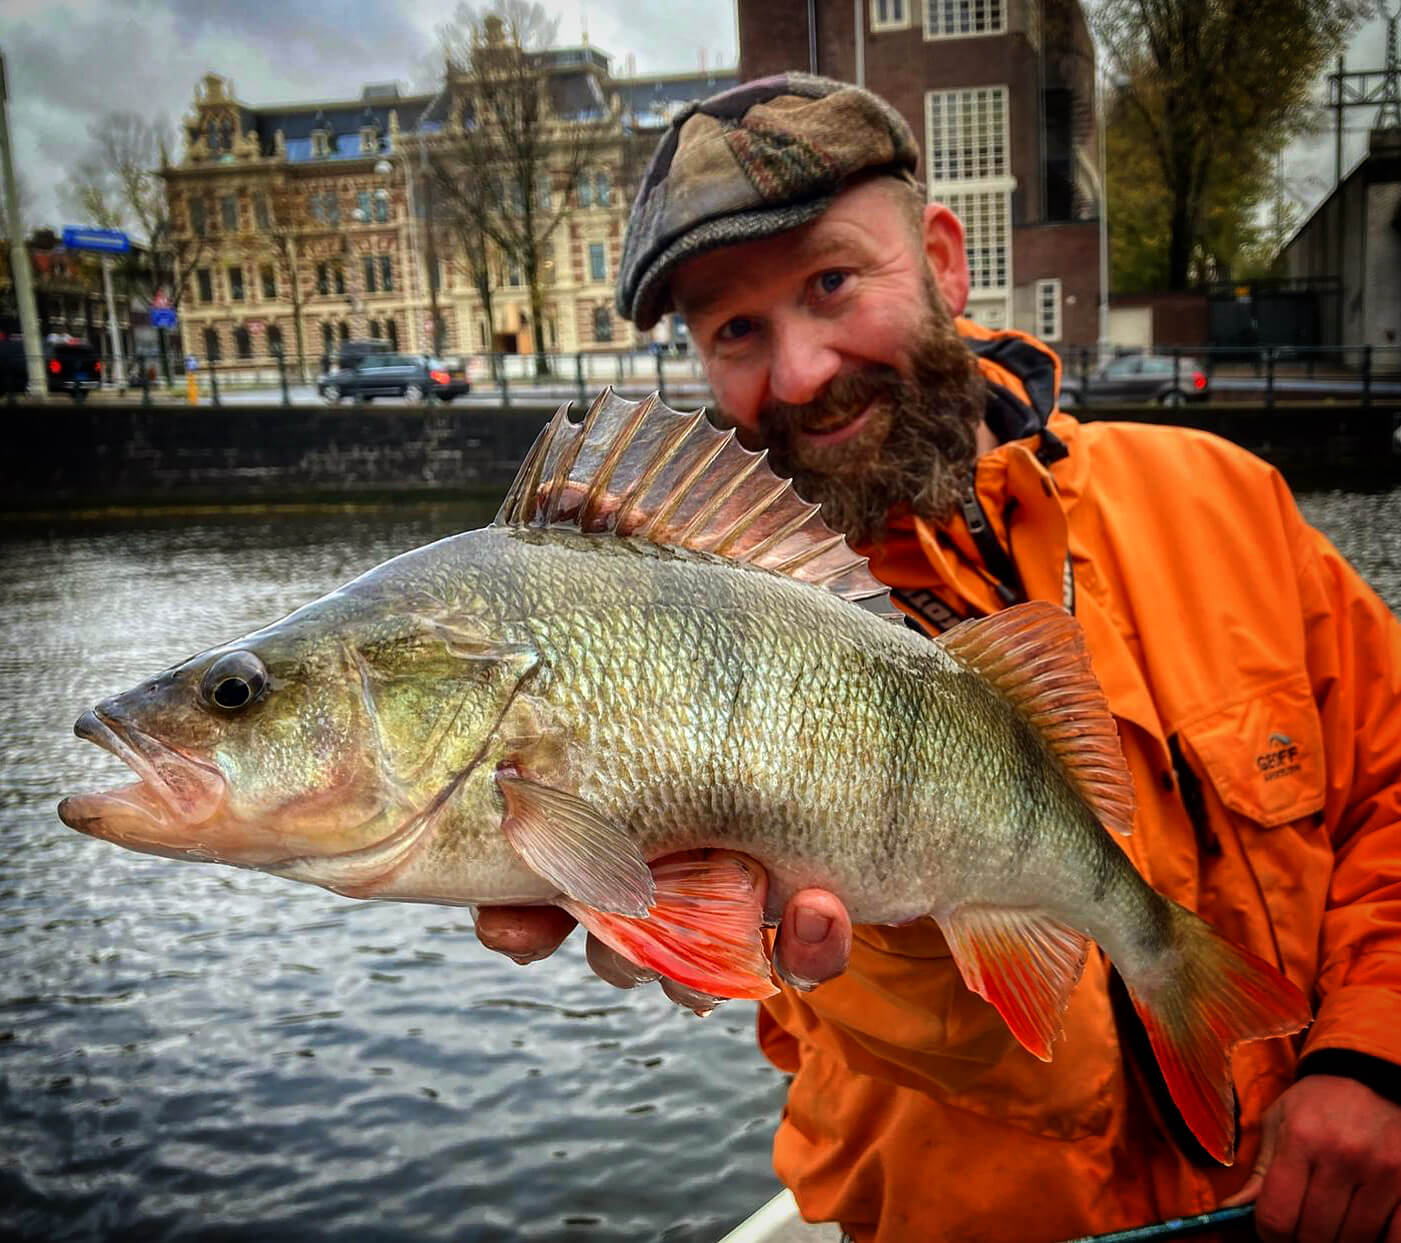 Amsterdam Fishing Guide Michael Stalenhoef